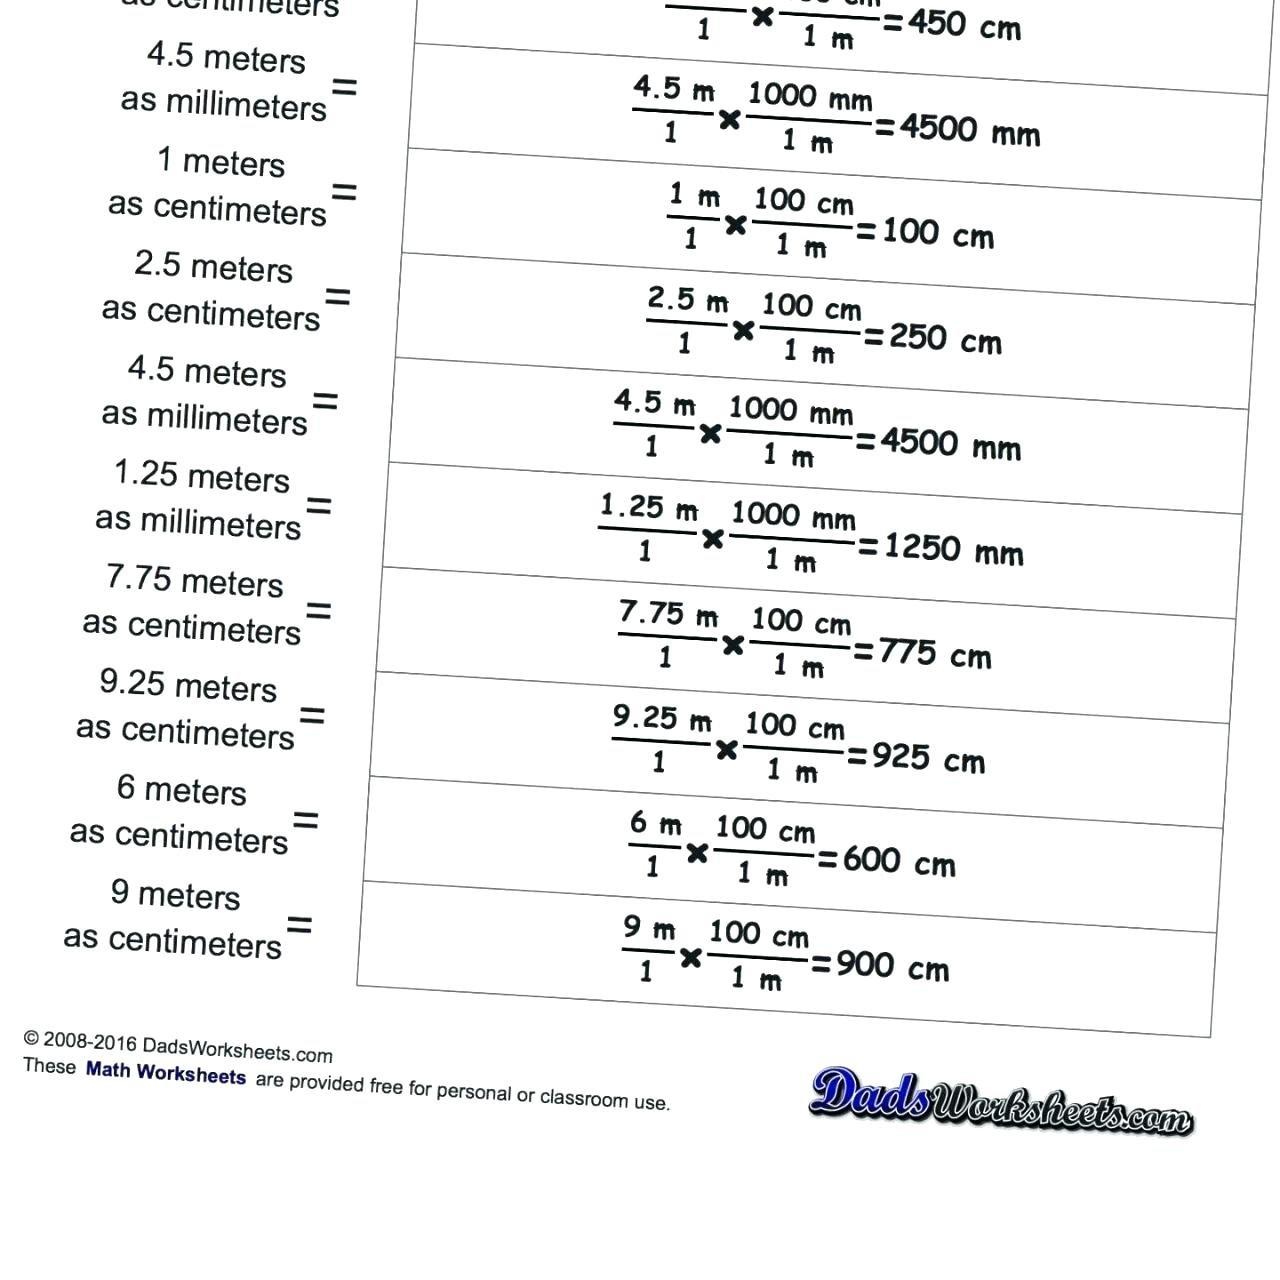 Measuring Units Worksheet Answer Math Worksheet Convert Measurements Or Unit Conversion Worksheet Answers